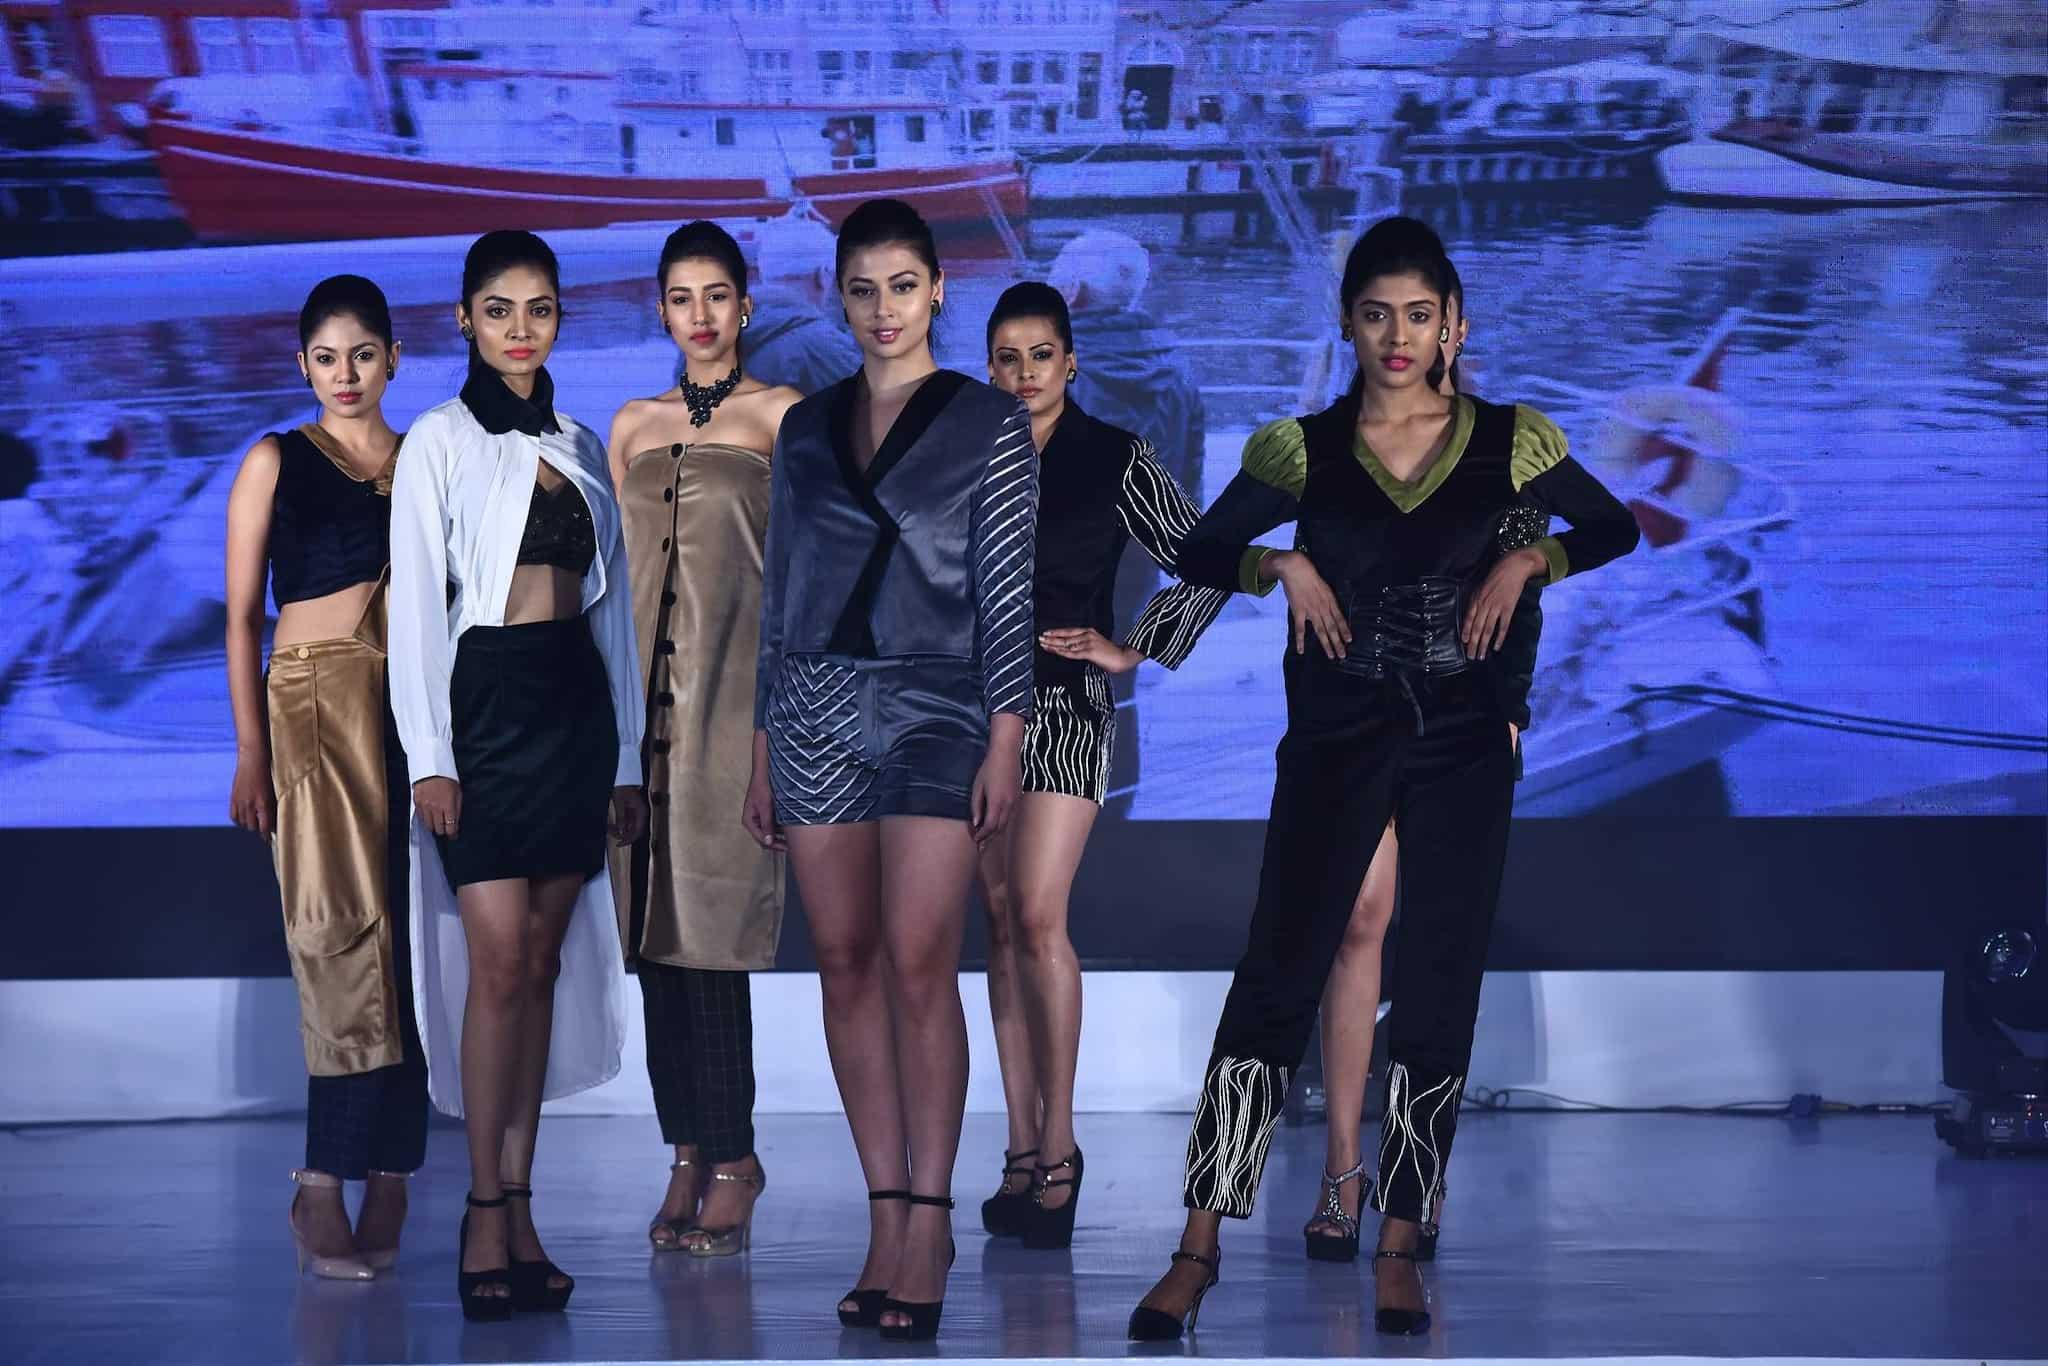 International Institute Of Fashion Design Reviews Kilpauk Chennai 109 Ratings Justdial Page 8